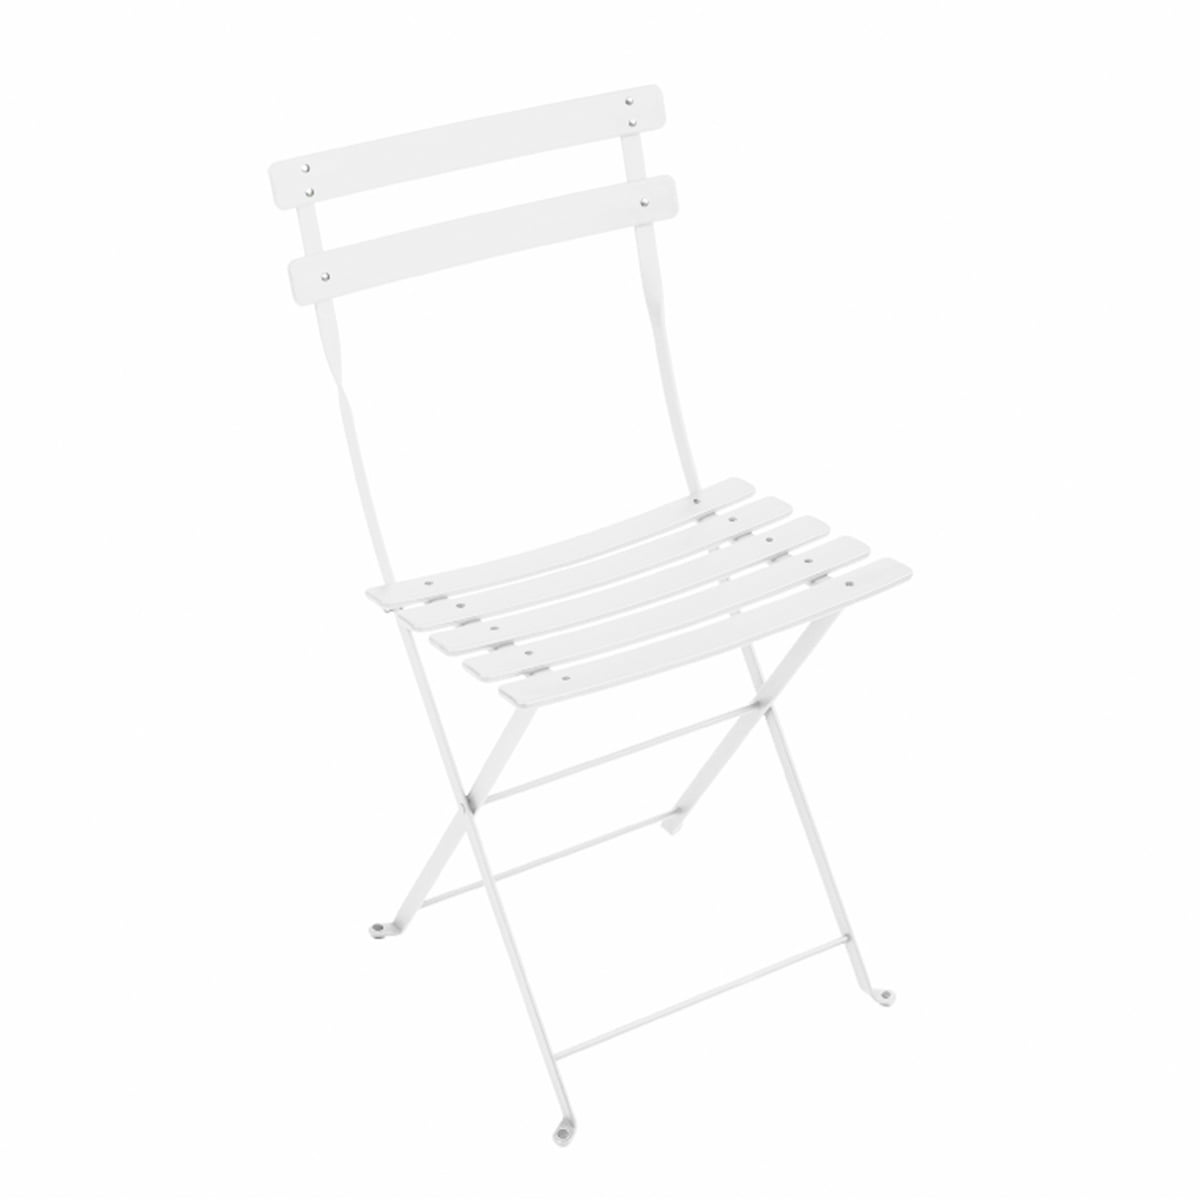 Bistro Duraflon Folding Chair by Fermob